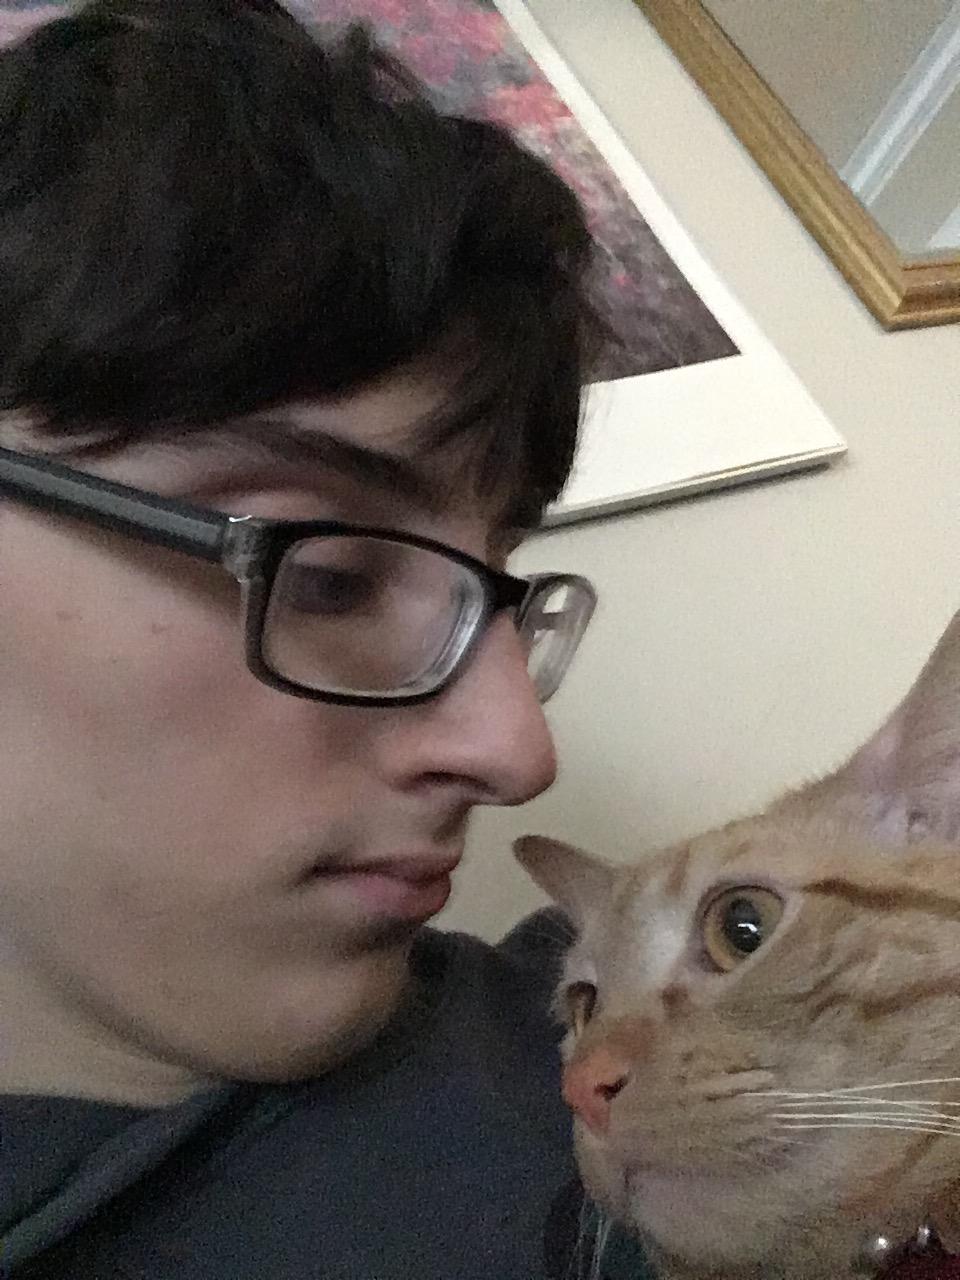 Junior Joseph Hyman takes a selfie with his pet cat.